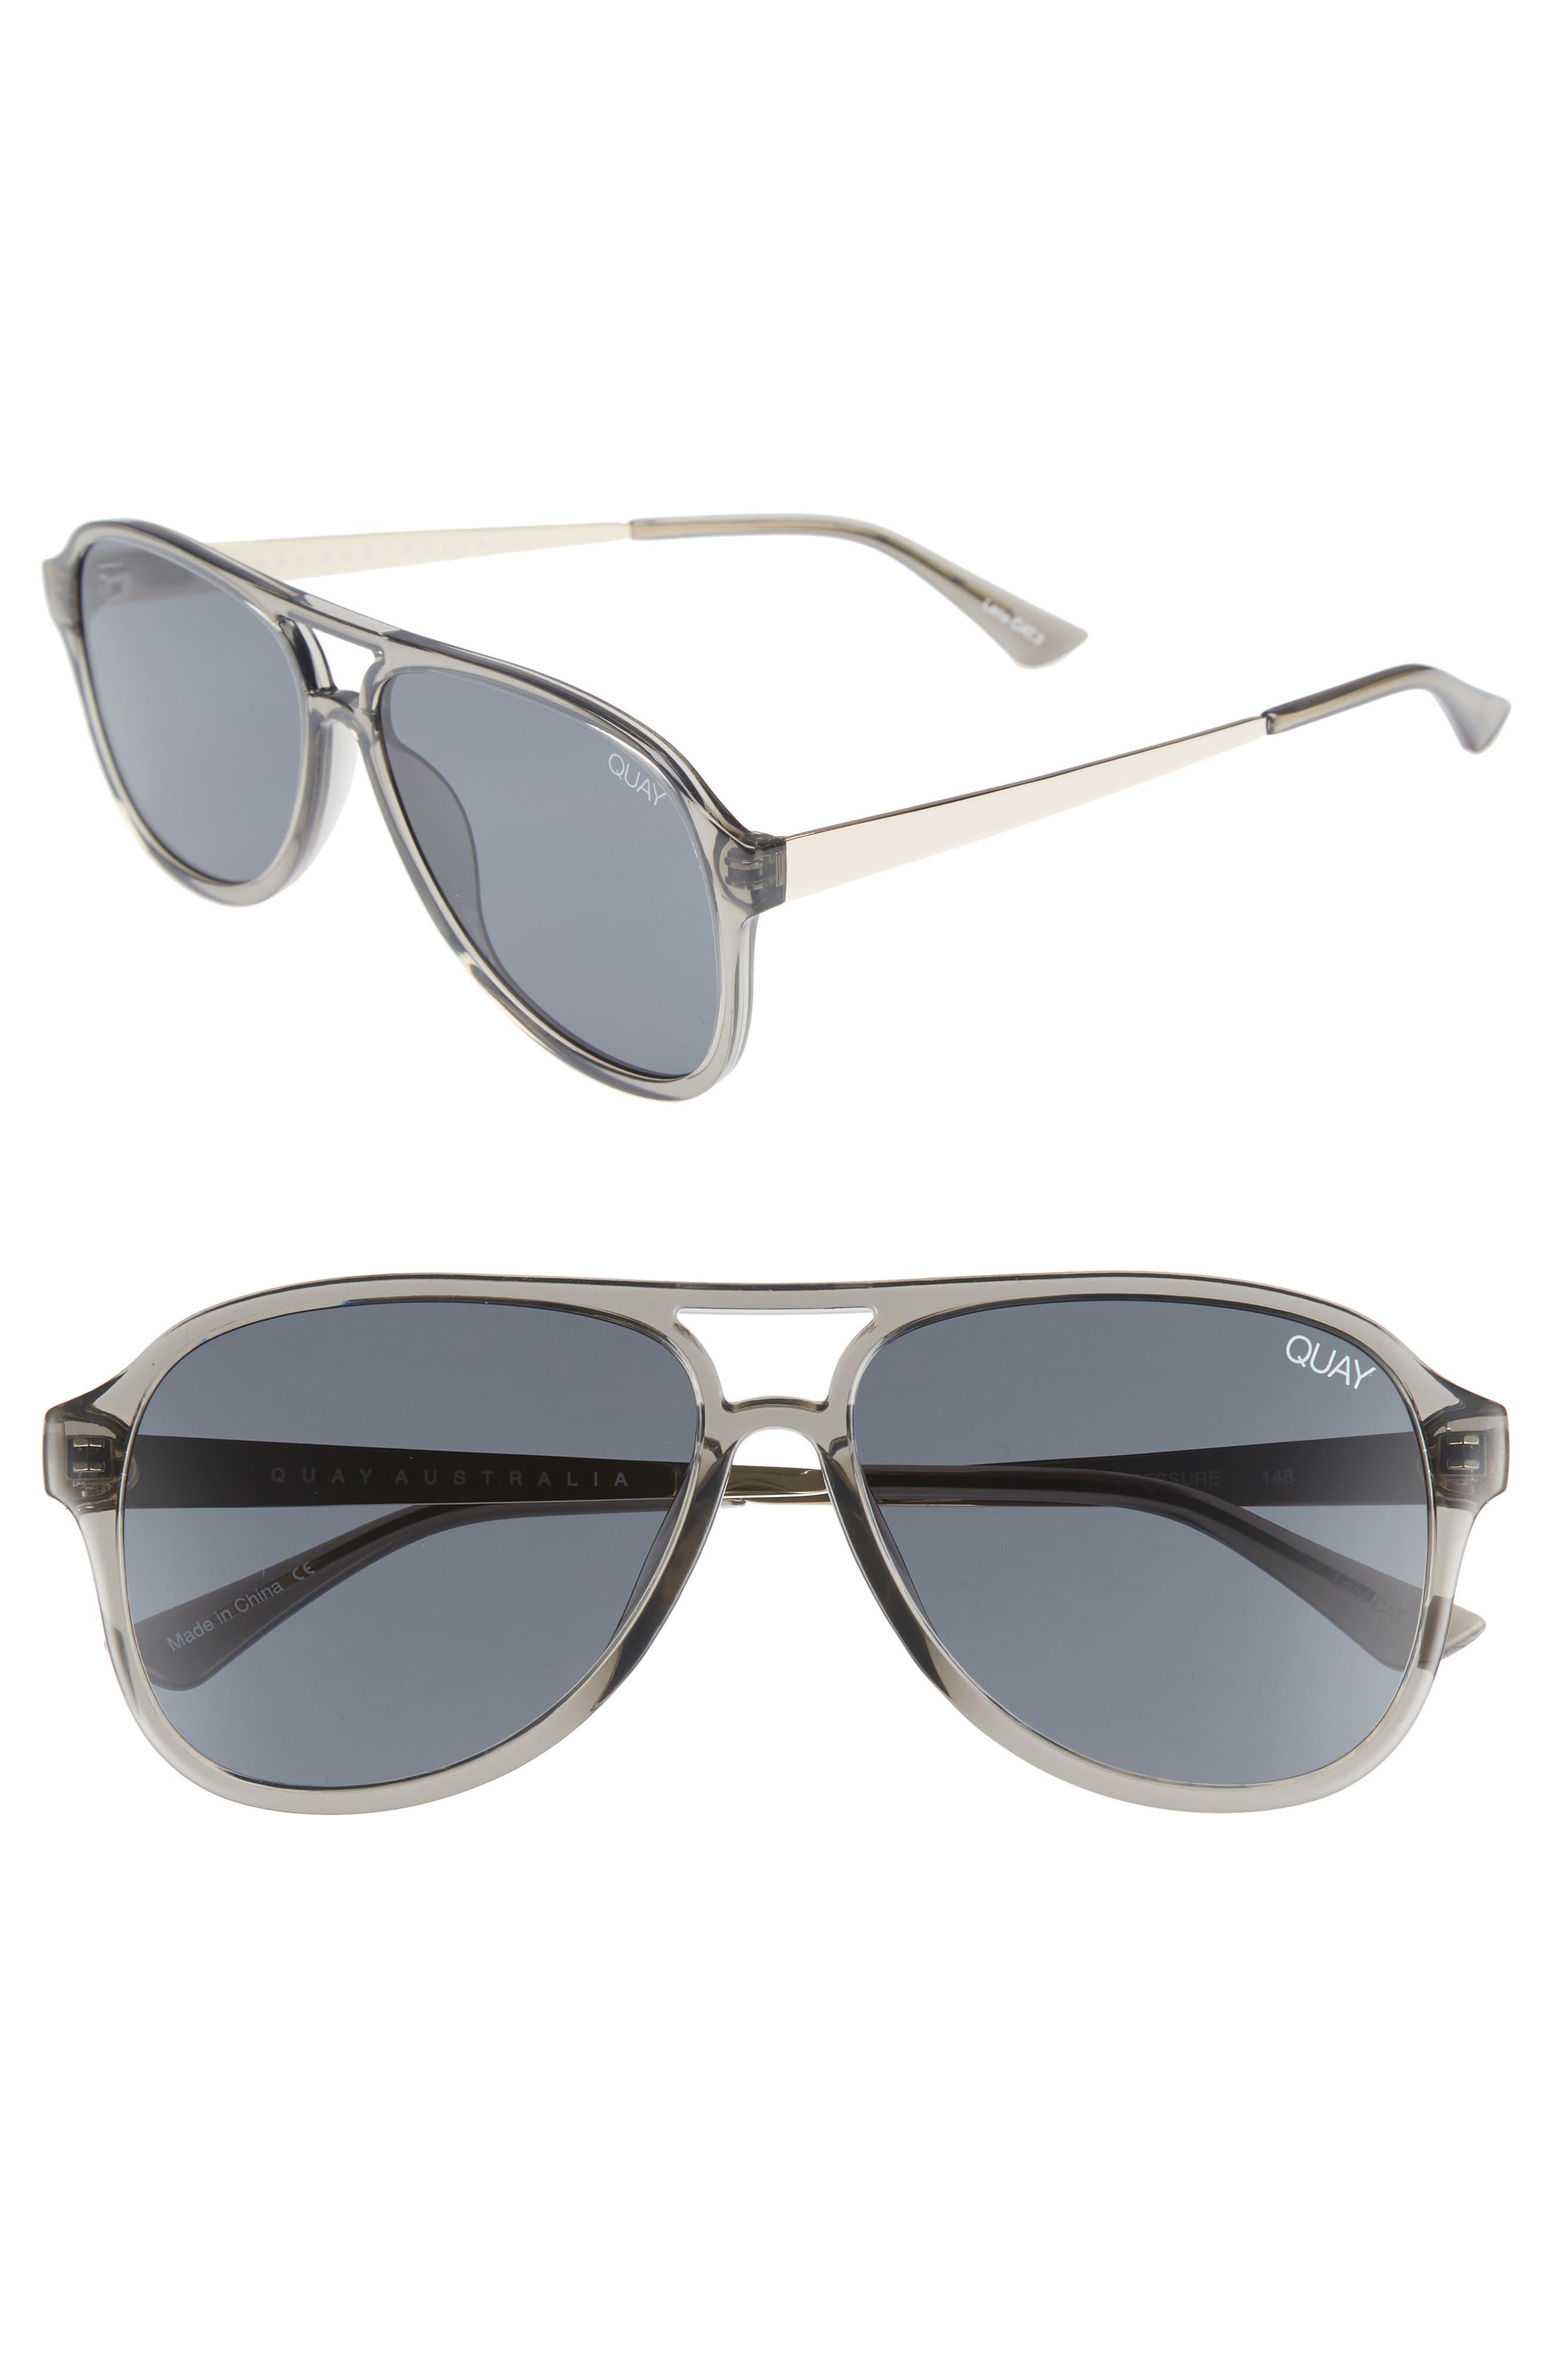 dccb70ecfb44 Quay Australia Sunglasses for Women   Nordstrom